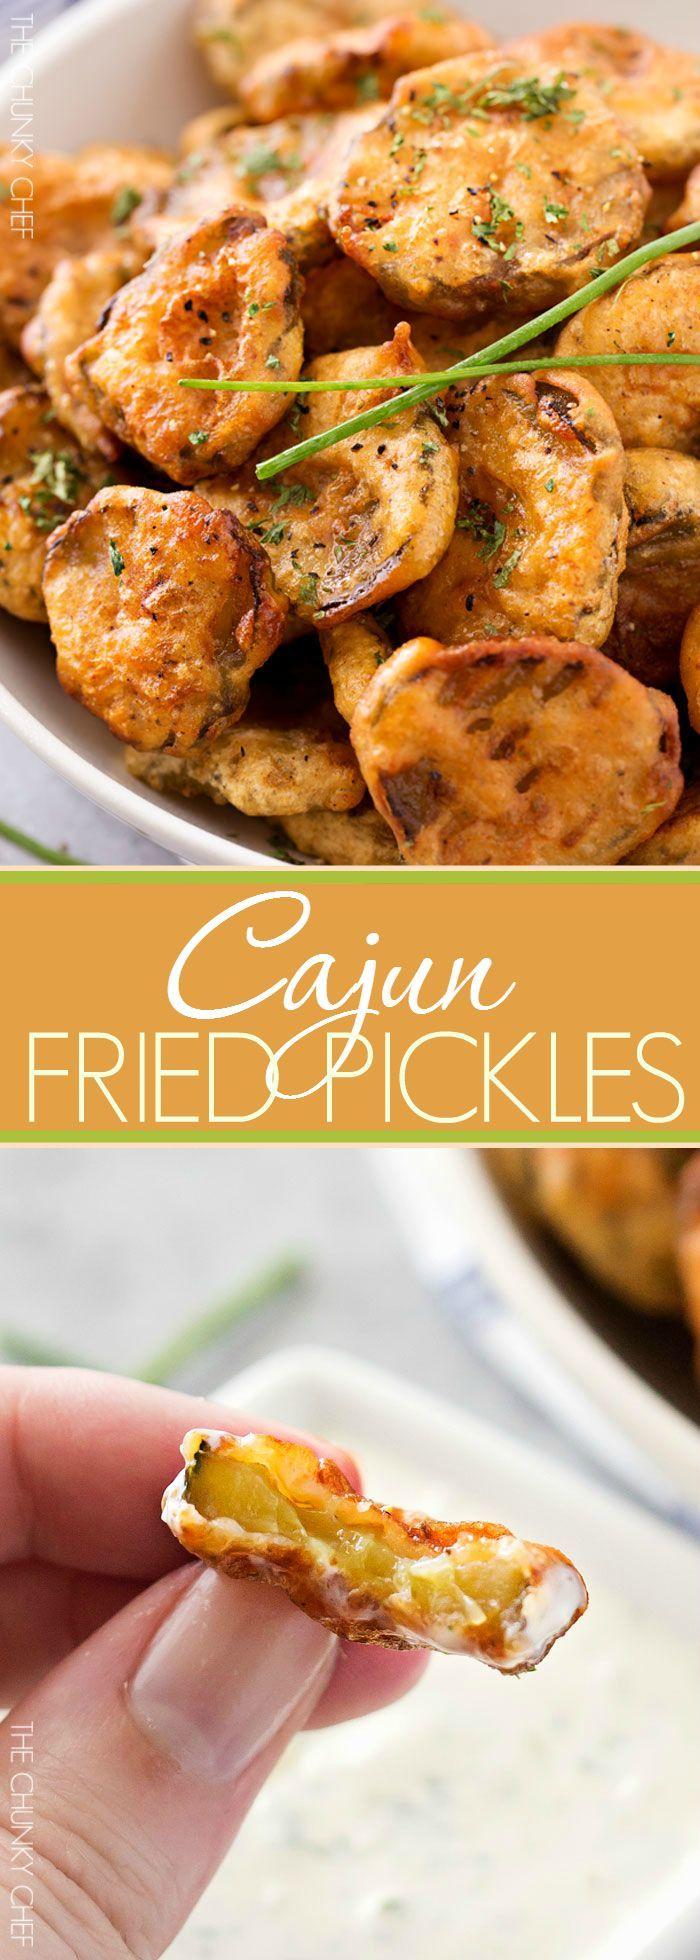 Cajun Fried Pickles with Garlic Blue Cheese Dip #cajuncooking